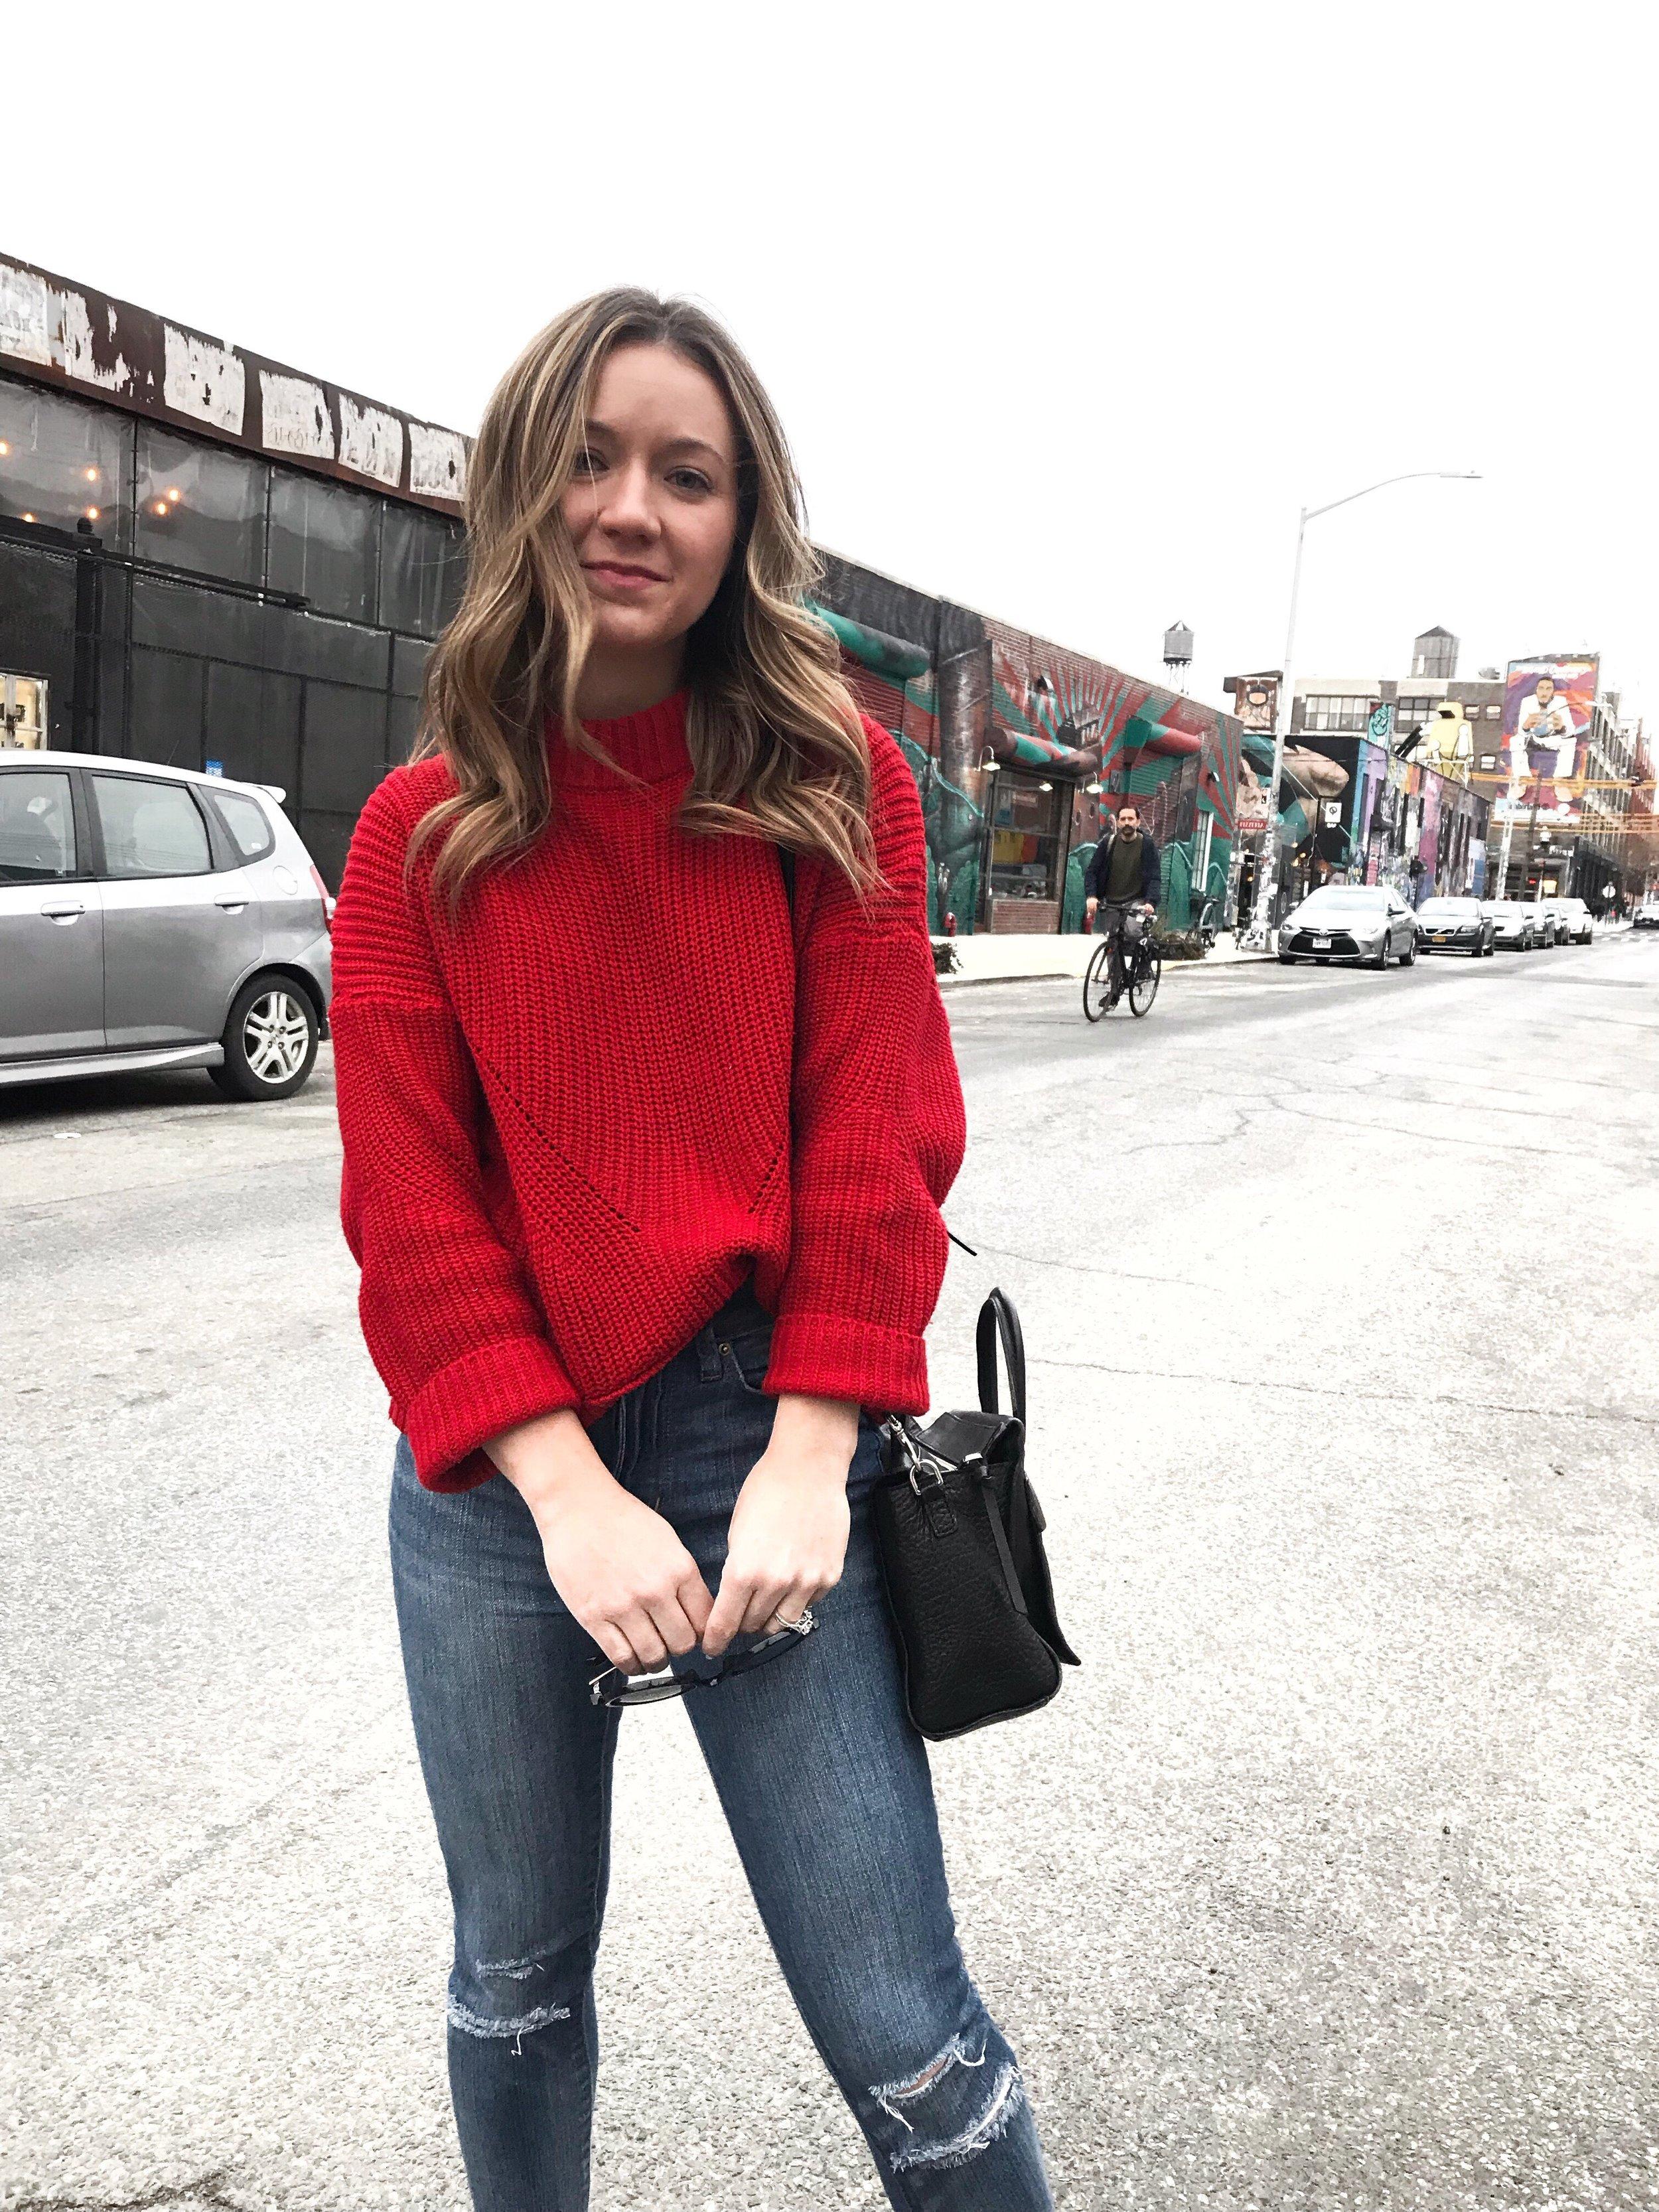 Fizz-Fade-red-sweater.JPG